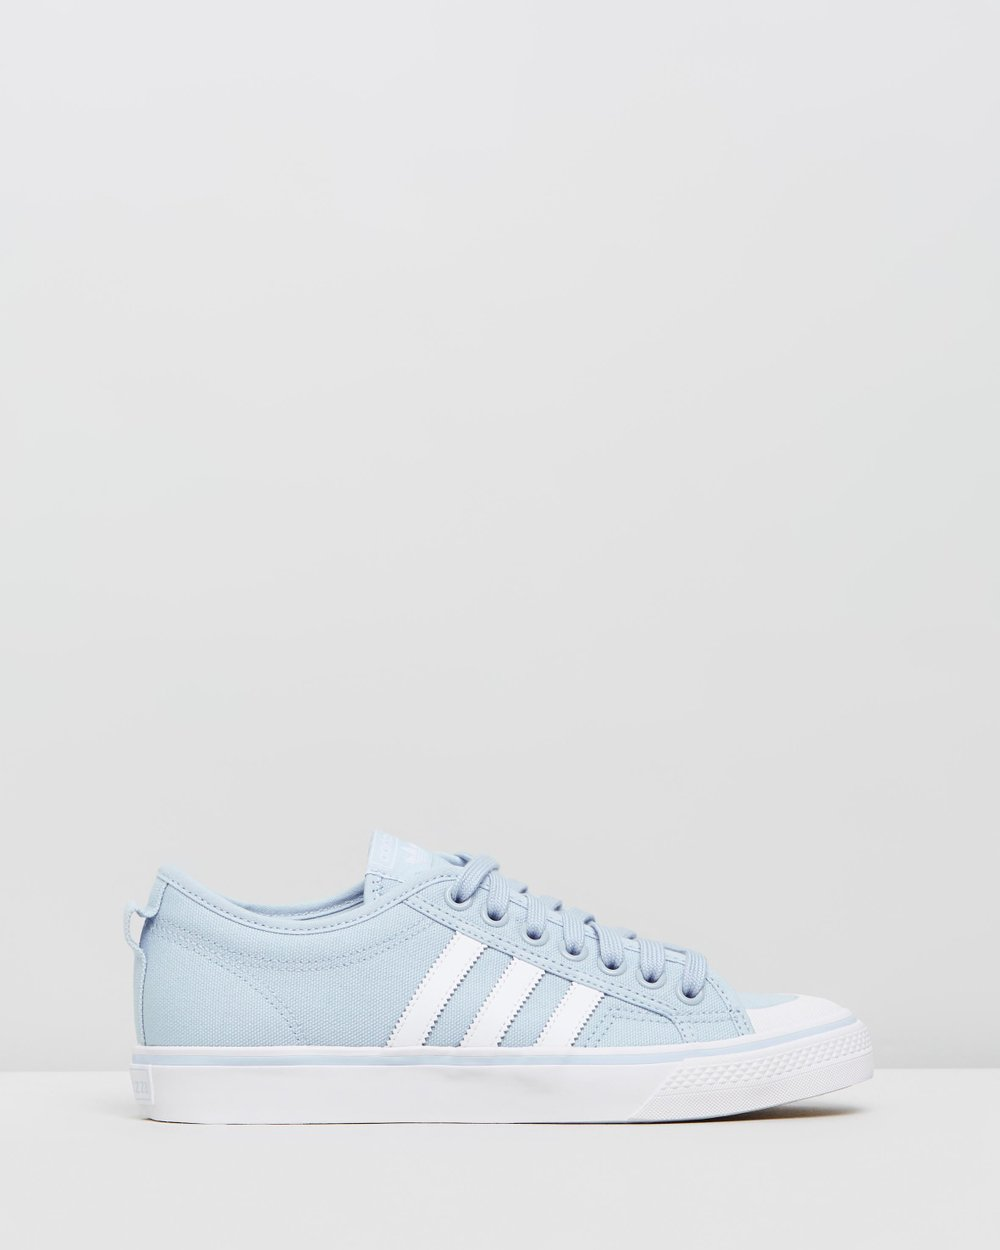 b9f0af8d29b3da Nizza - Women s by adidas Originals Online